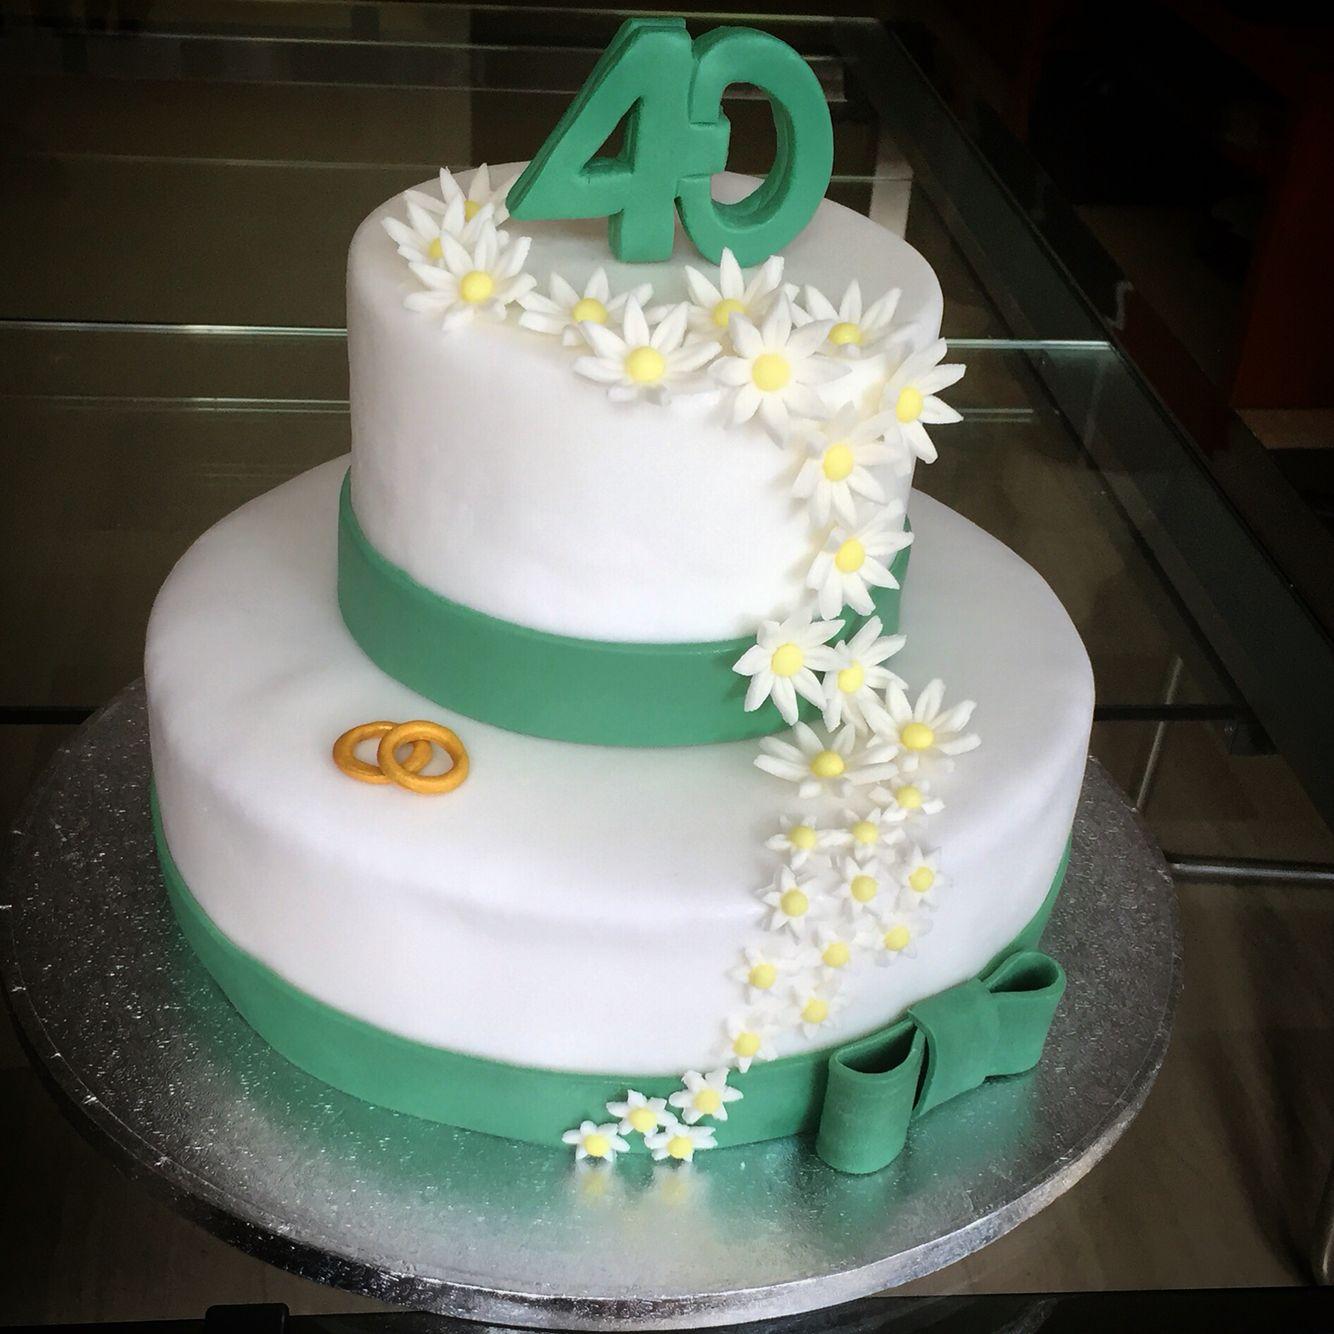 Torta Per I 40 Anni Di Matrimonio Instafood Ilas Ilassweetness Pastadizucchero Cakedesign A Anniversario Di Matrimonio Anniversario Matrimonio